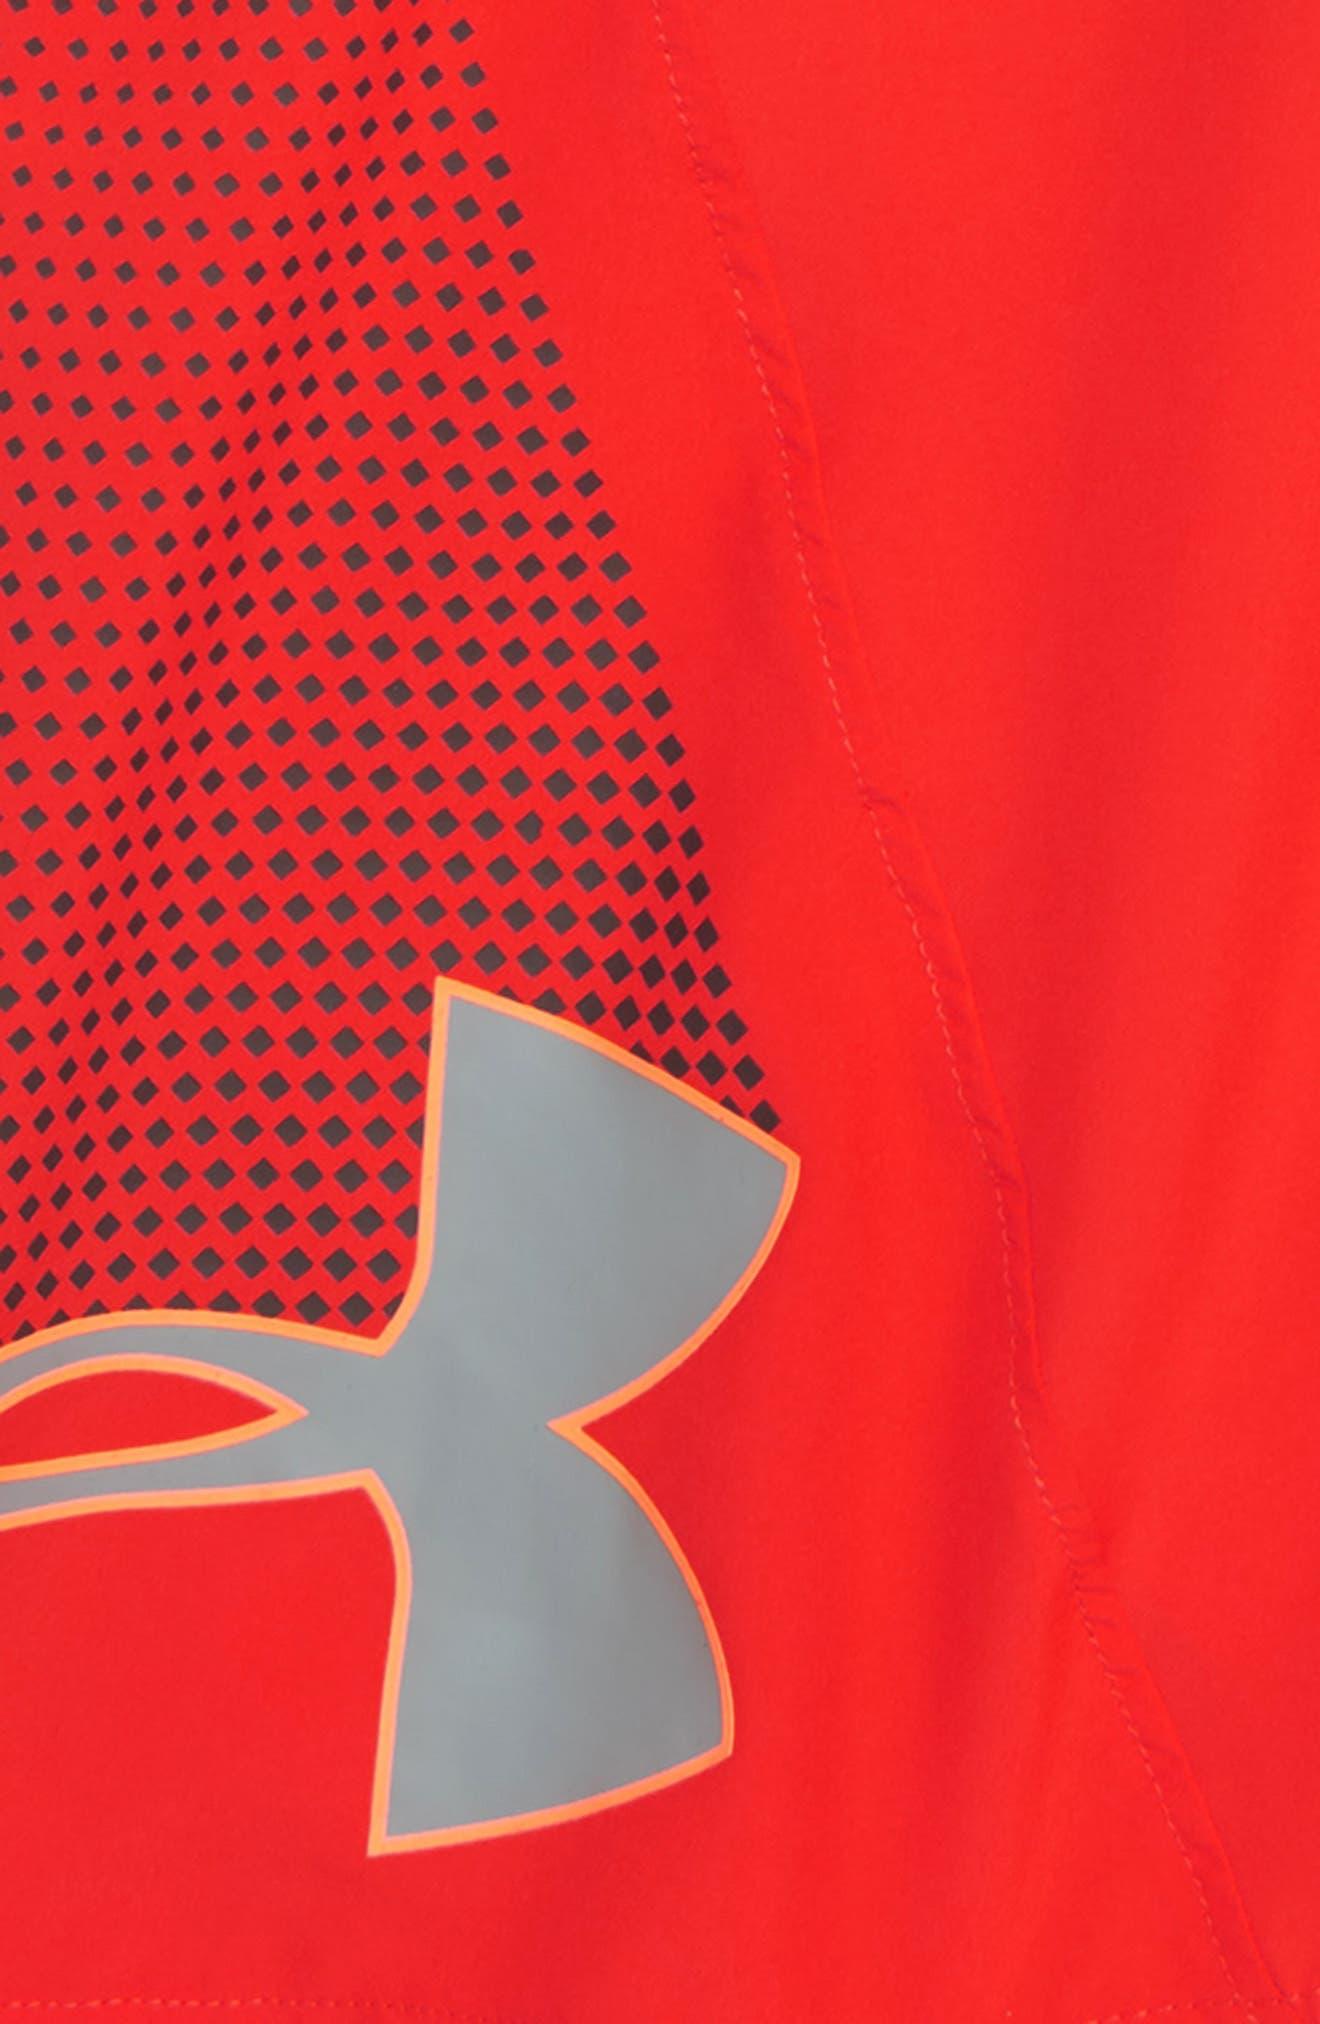 Evolve HeatGear<sup>®</sup> Woven Shorts,                             Alternate thumbnail 2, color,                             RADIO RED/ CHARCOAL